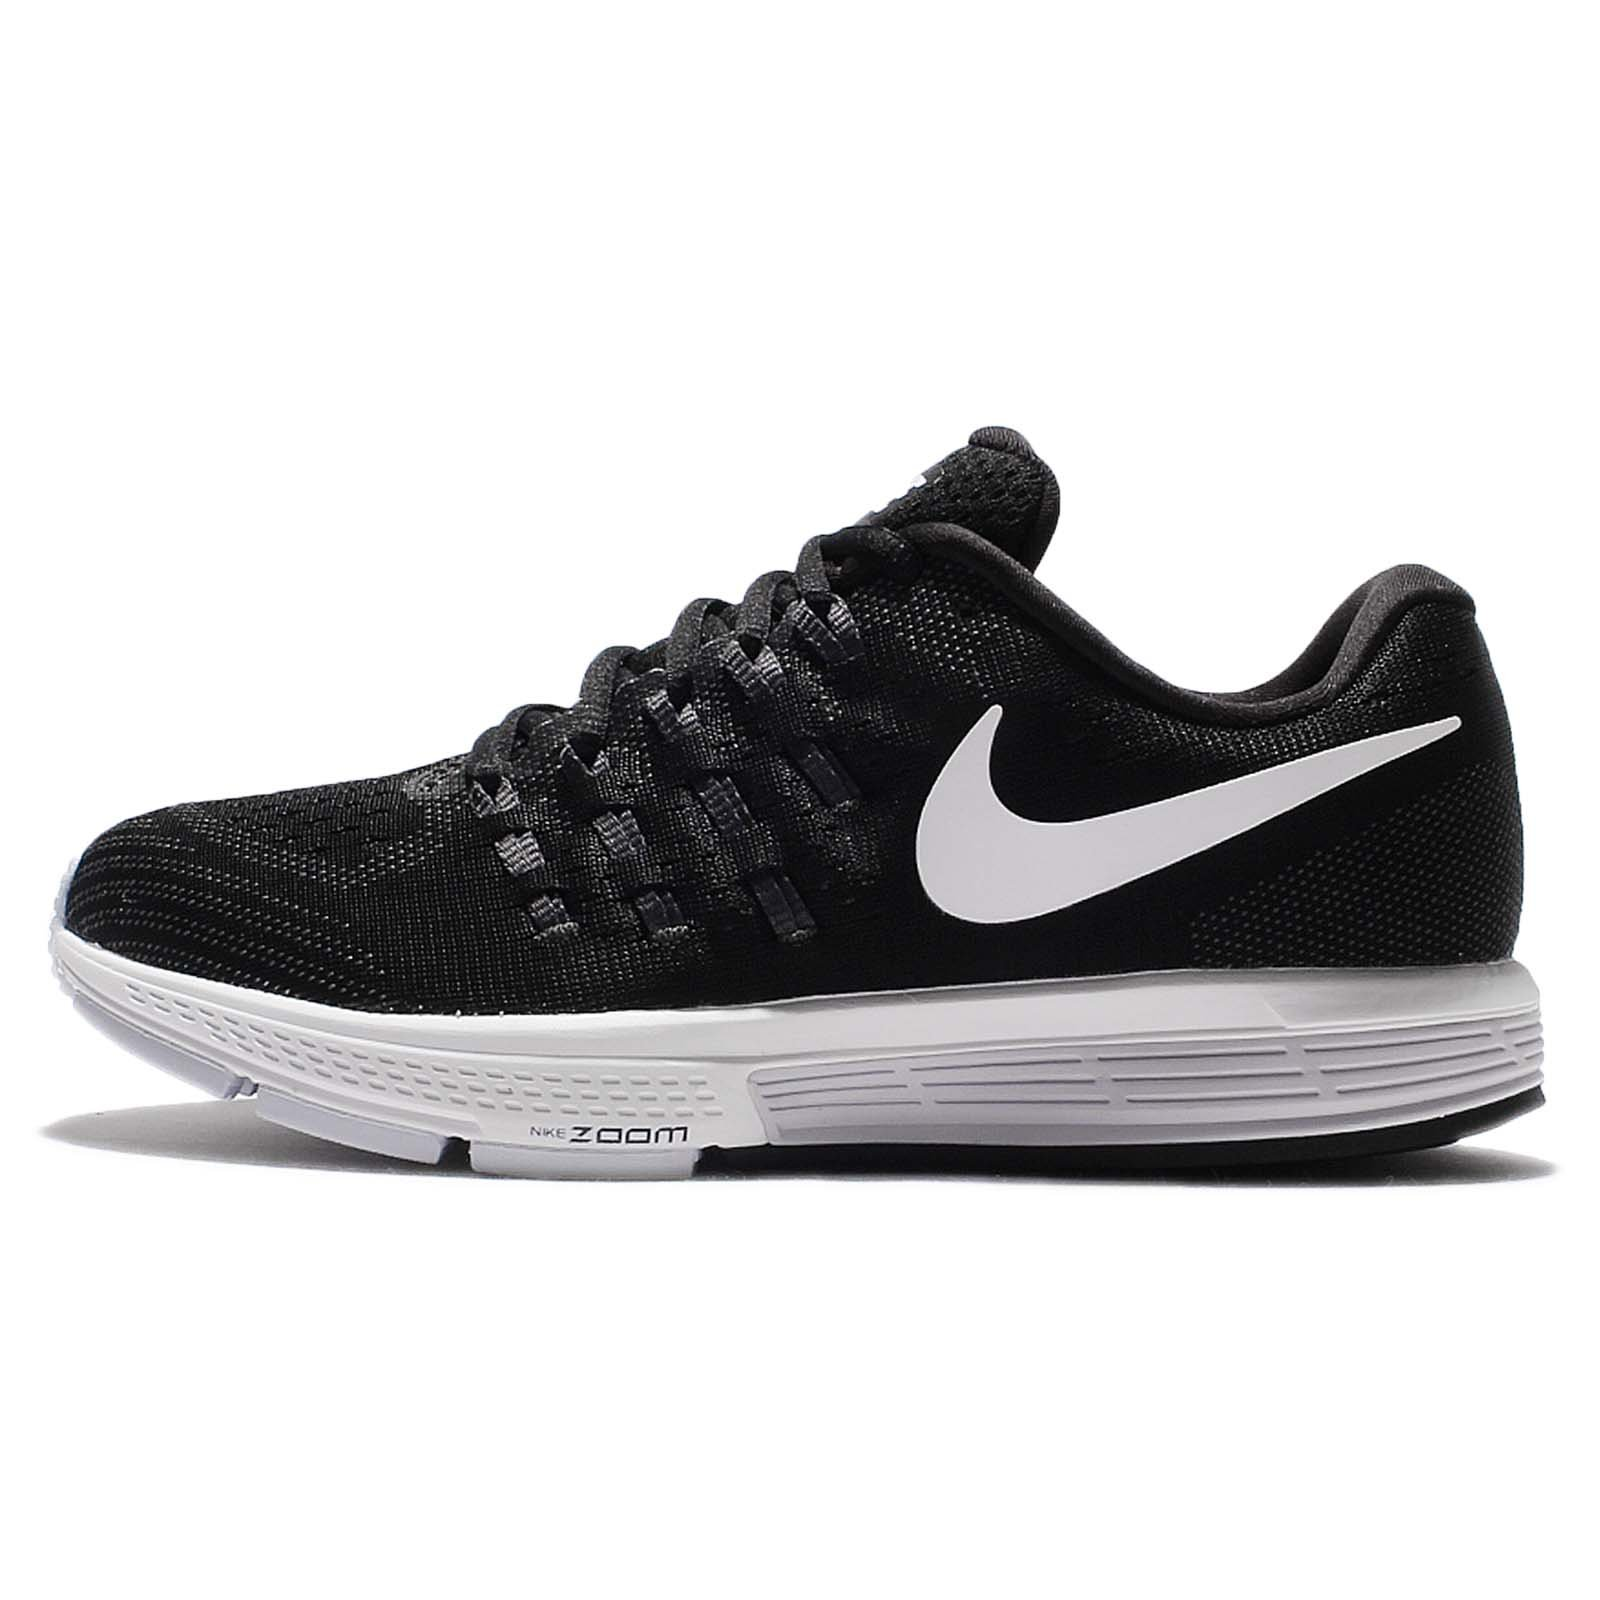 d0107703e0a8 Galleon - Nike Womens Air Zoom Vomero 11 Running Shoe (6.5 B(M) US ...